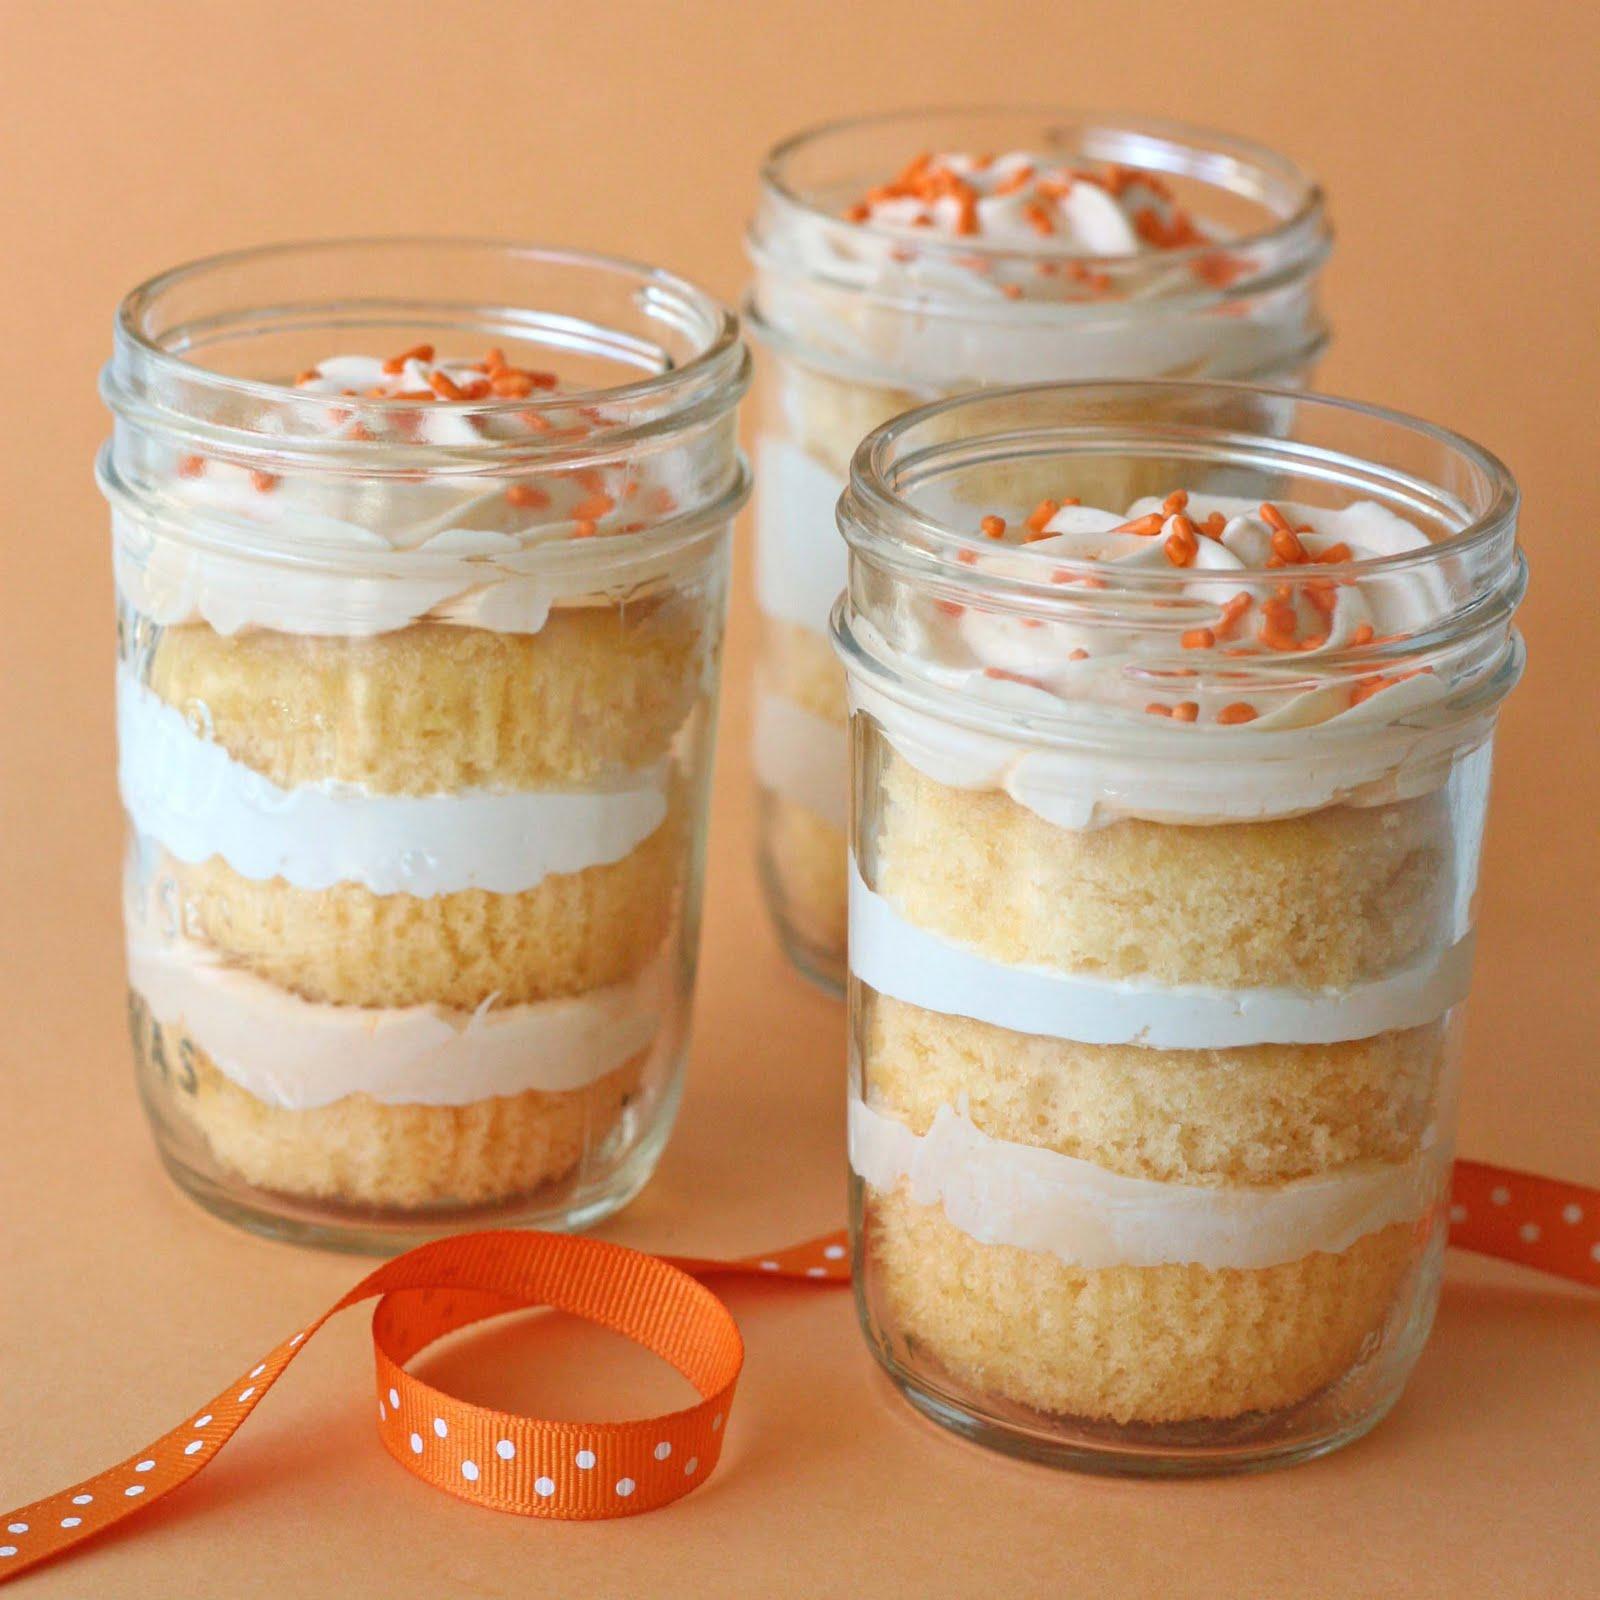 Orange Dreamsicle Cupcakes In A Jar Glorious Treats